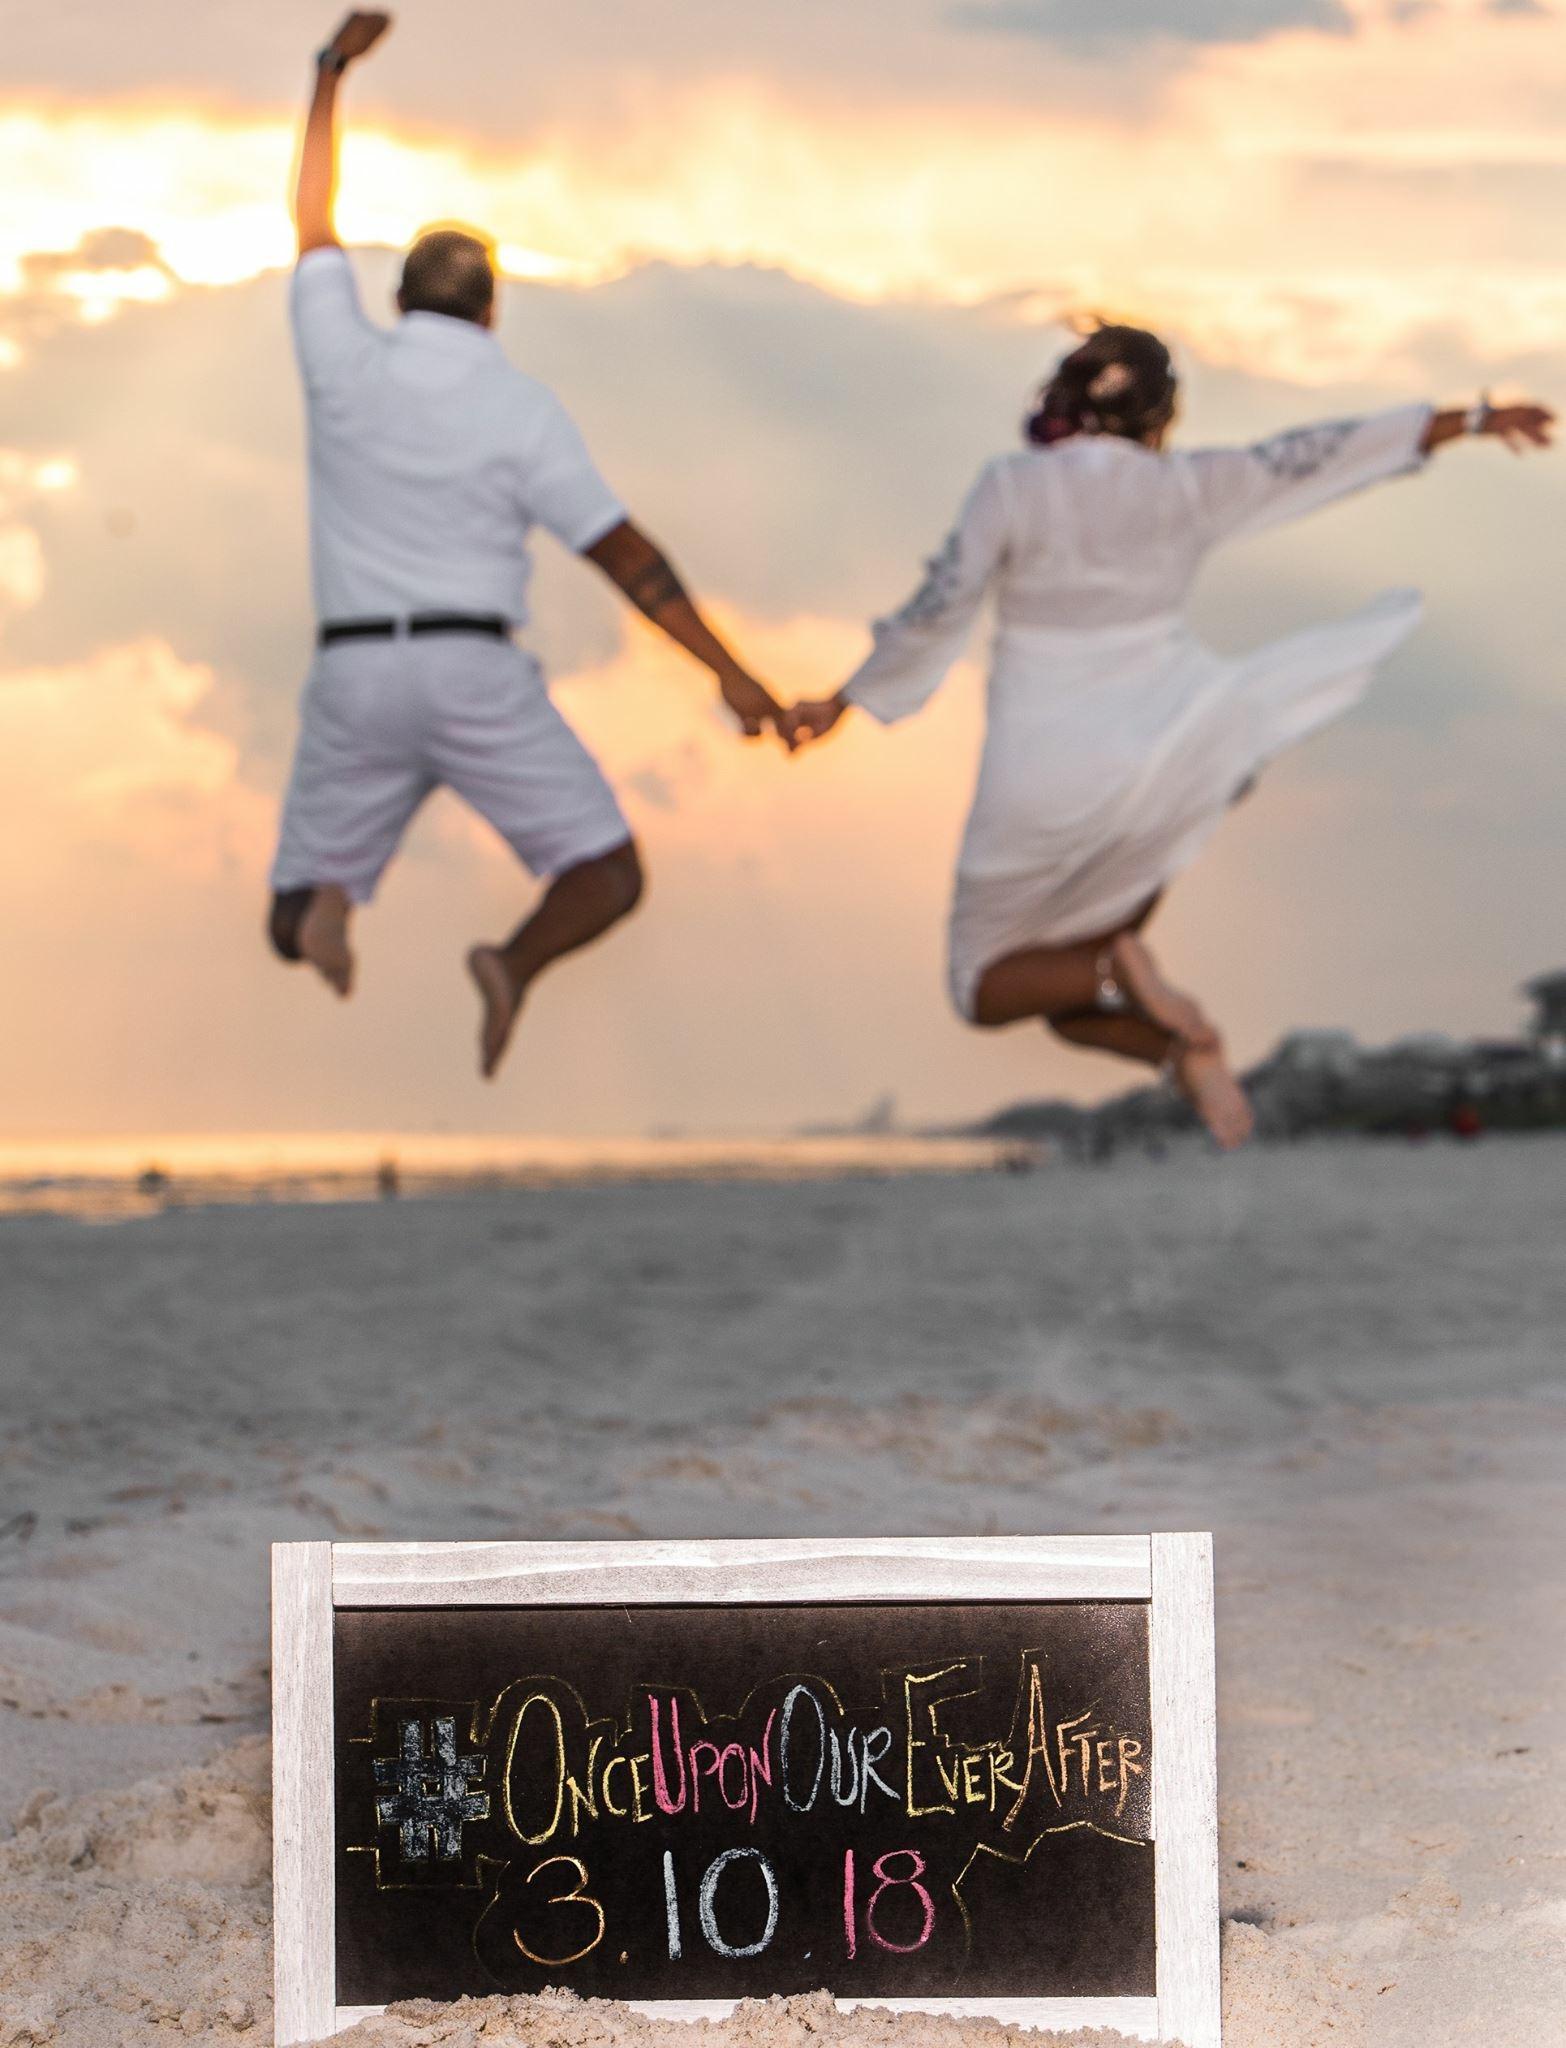 Kimberly and dustins wedding website registry malvernweather Gallery